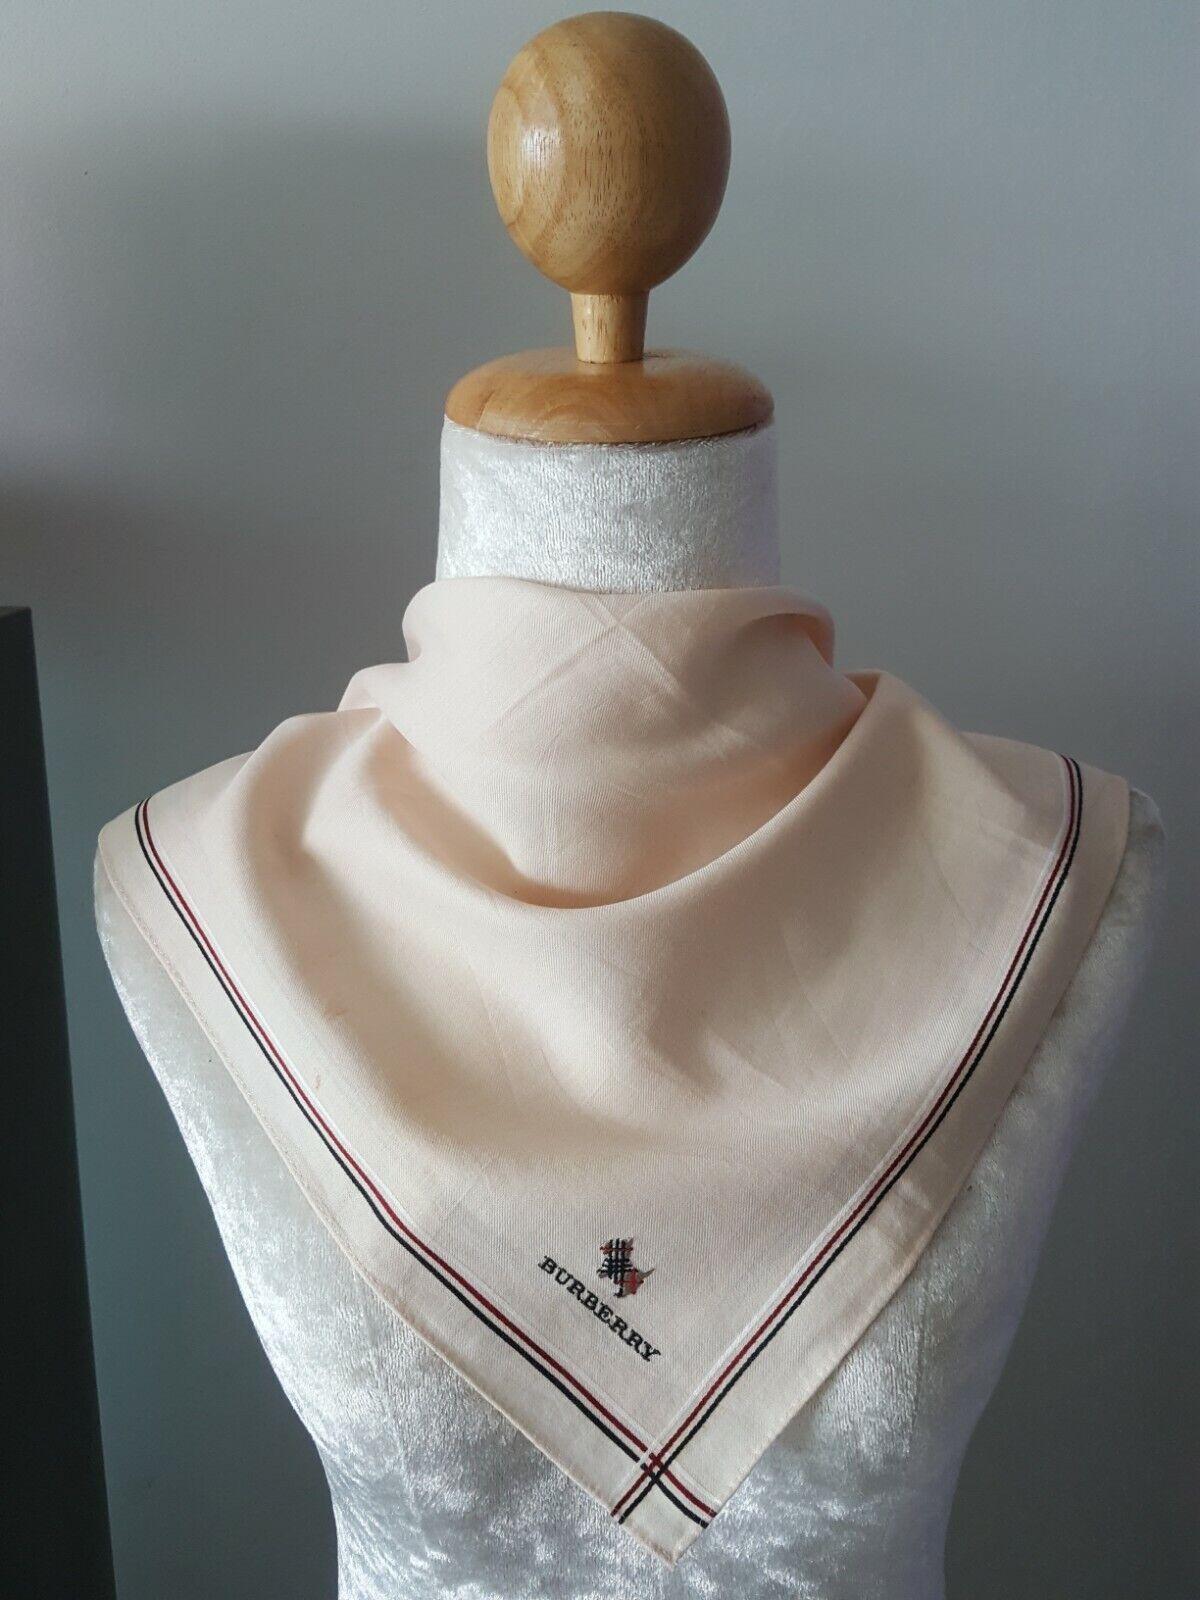 BurberryUnisex Plain Embroidered Dog Logo Square Cotton Handkerchief 18